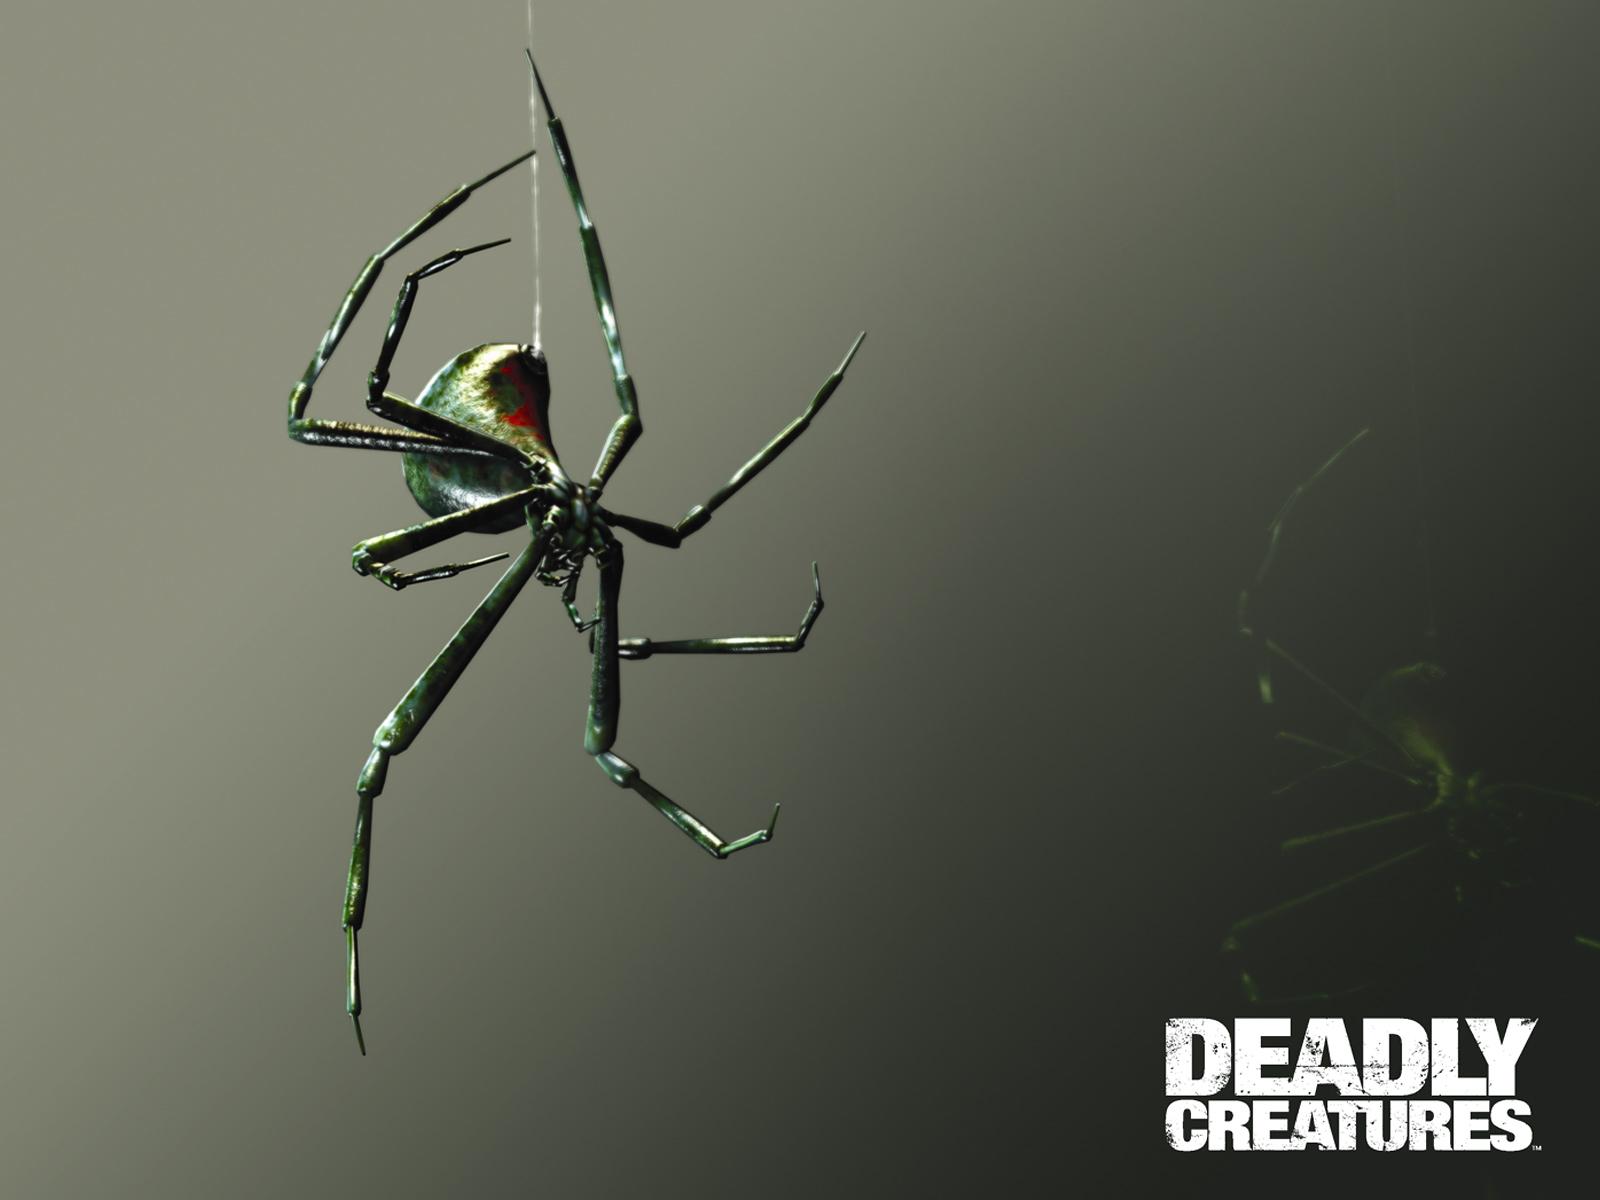 Black Widow   Deadly Creatures 1600x1200